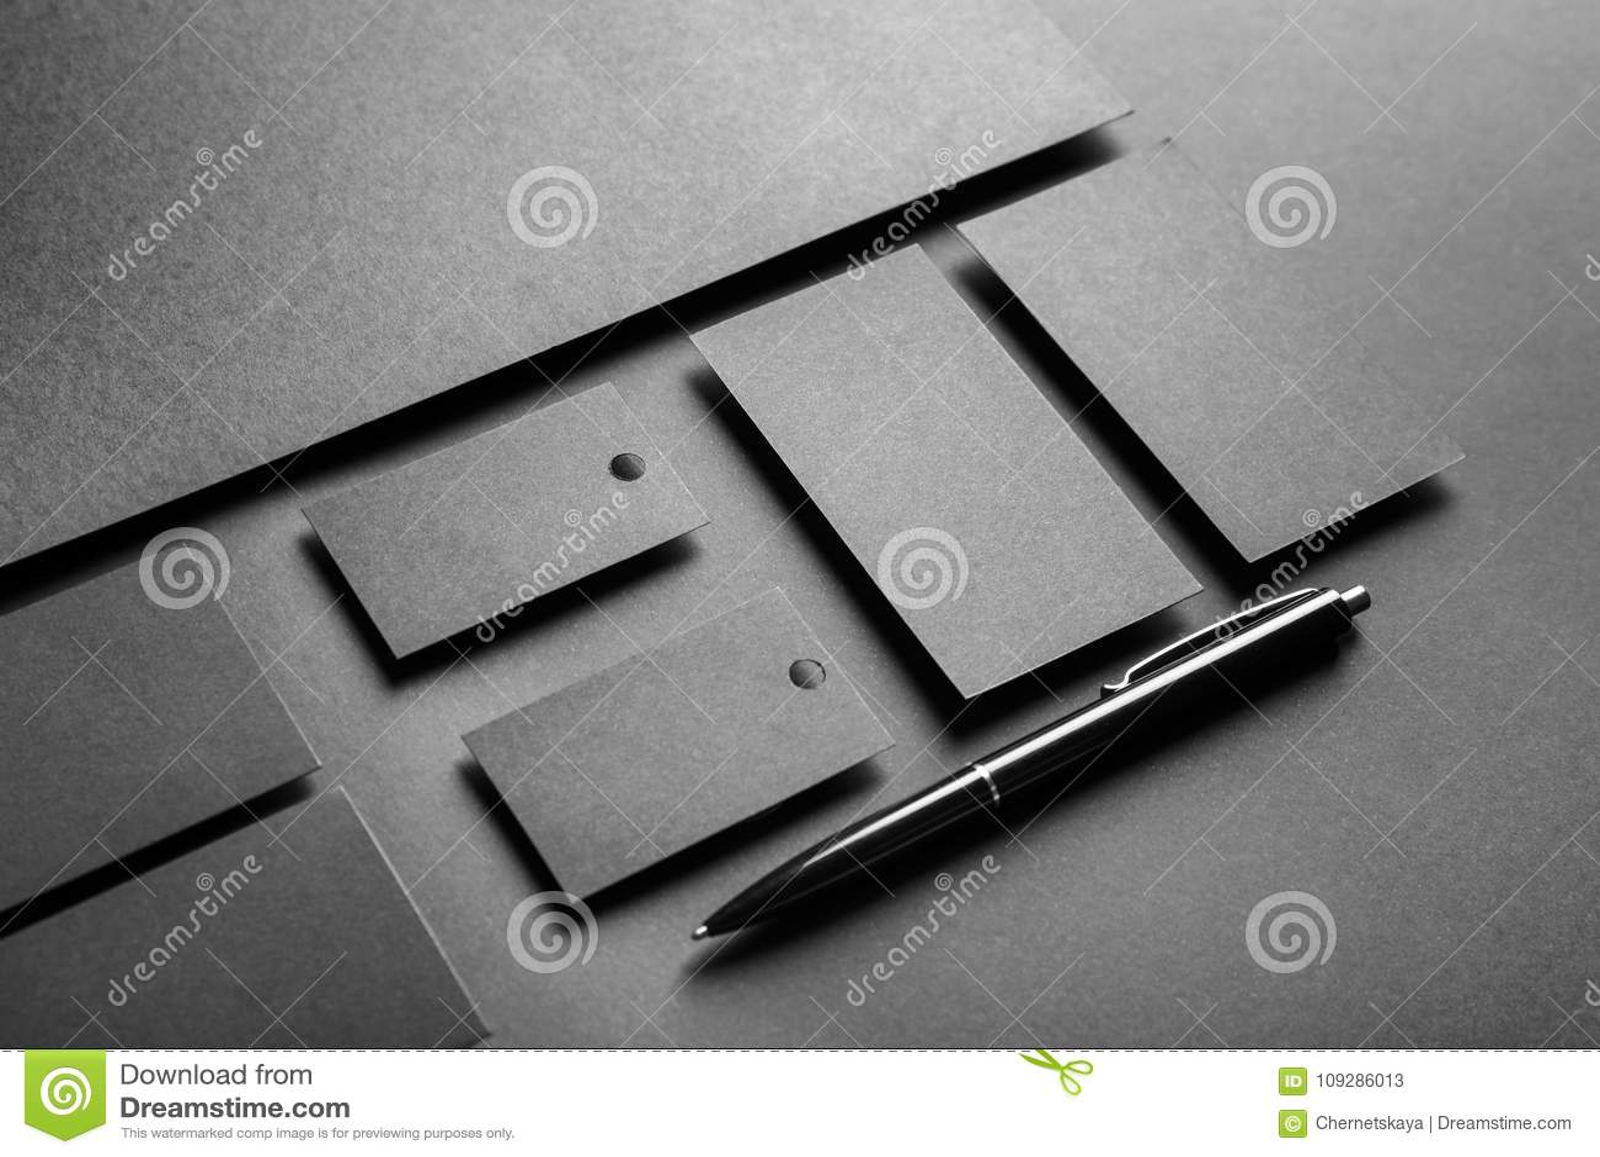 Blank items as mockups for branding